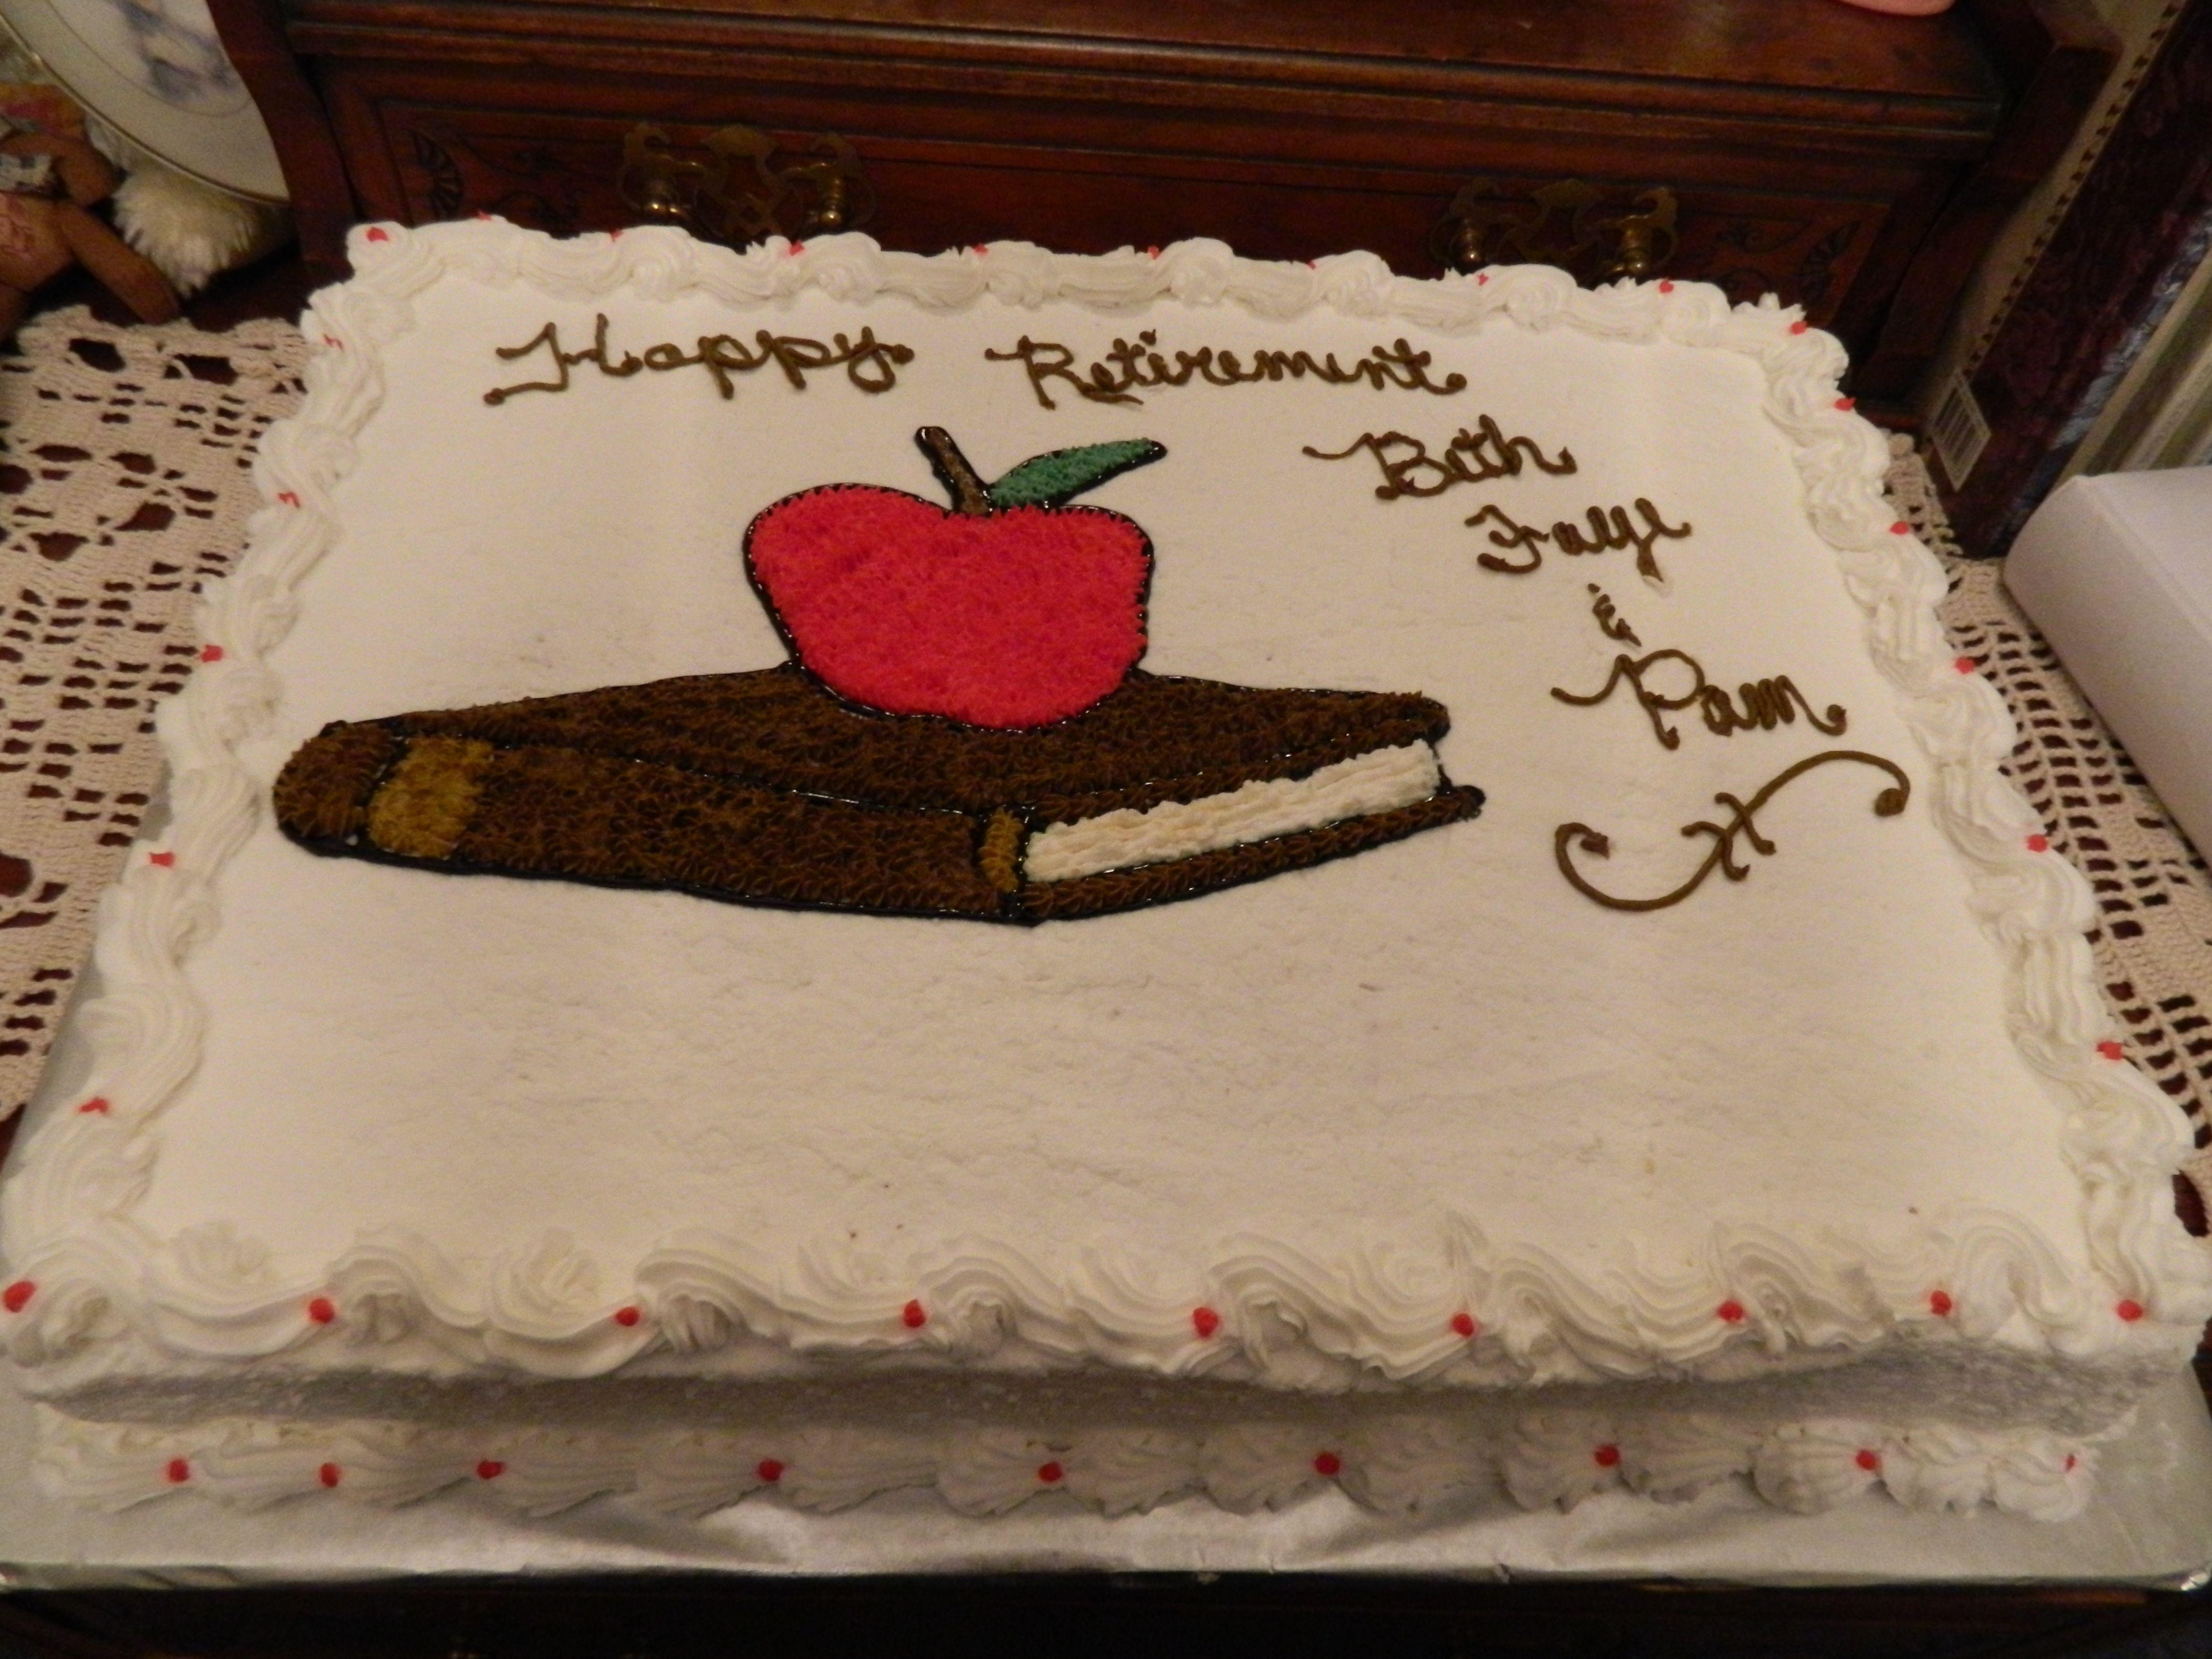 Retirement Cake Designs For Teachers : School Teacher s Retirement Cake CAKES Pinterest